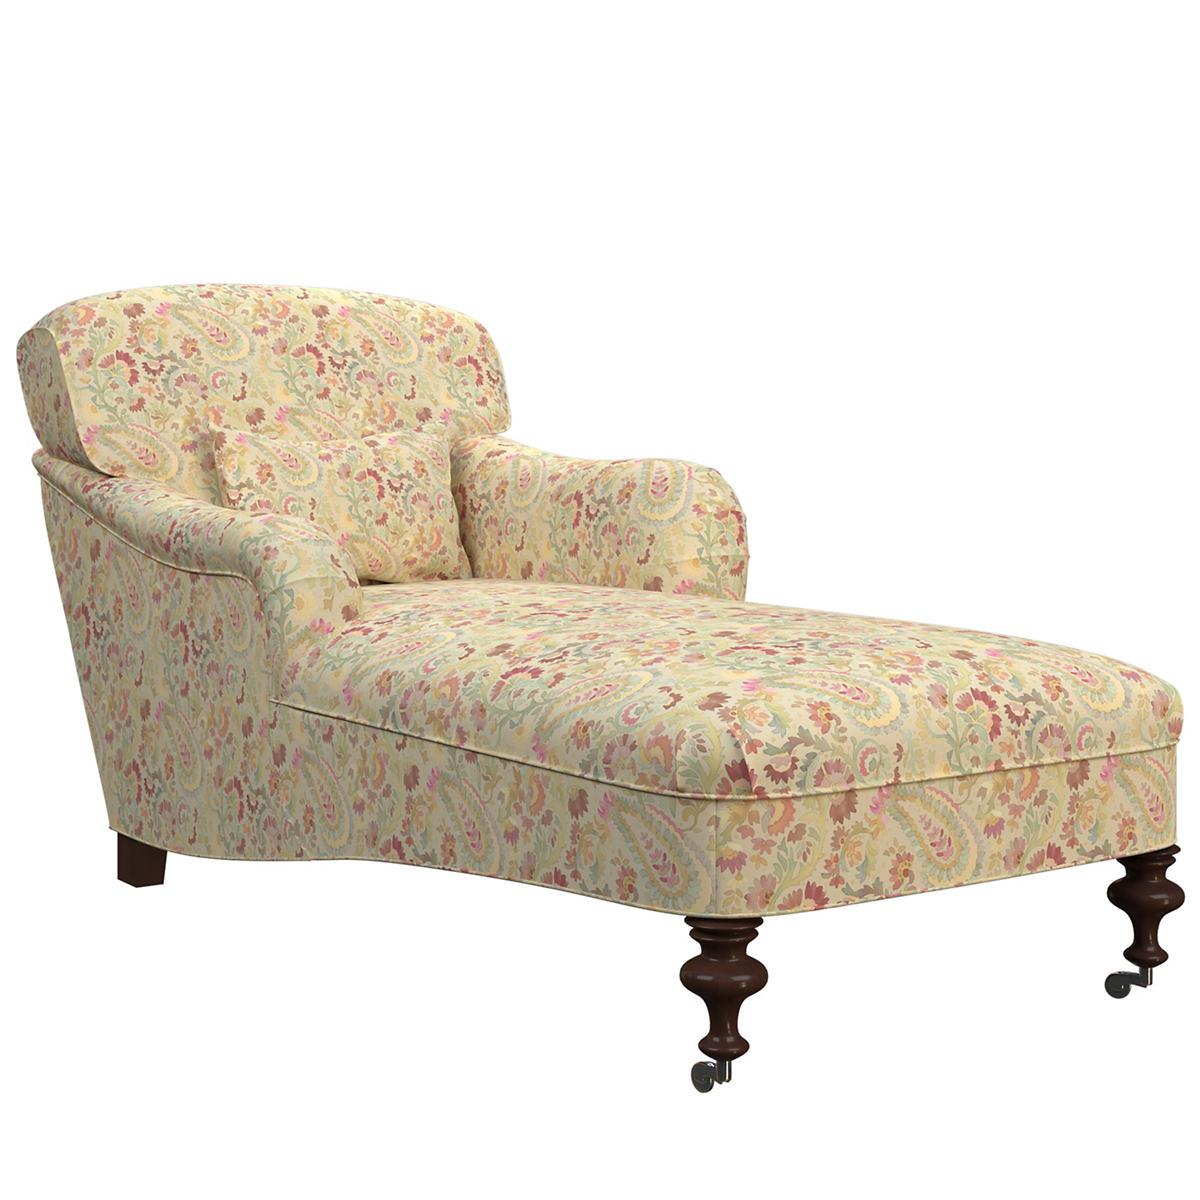 Ines Linen Beaufort Chaise